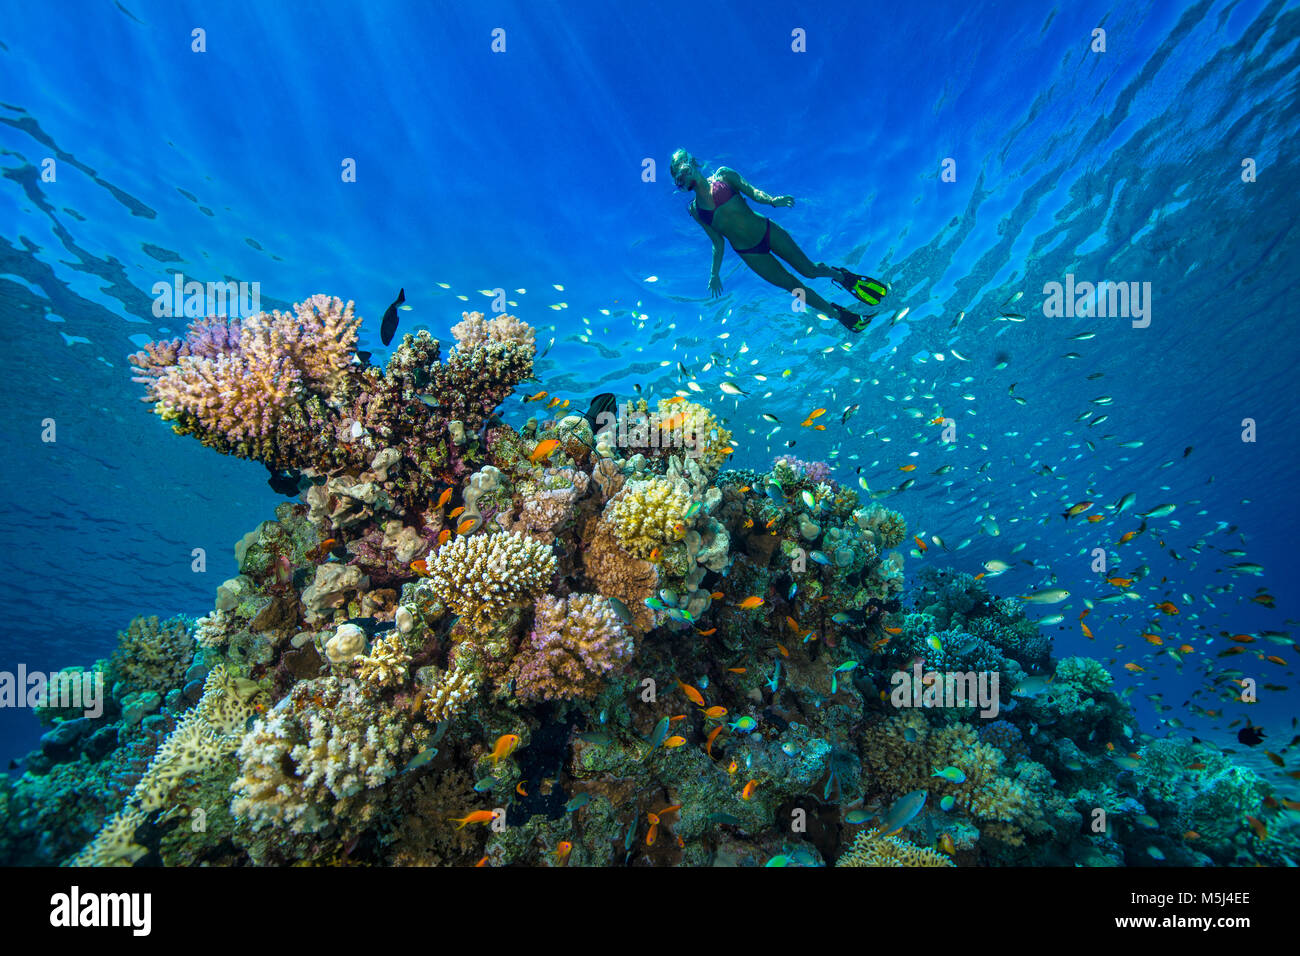 Egipto, El Mar Rojo, Hurghada, joven snorkeling en arrecifes de coral Imagen De Stock